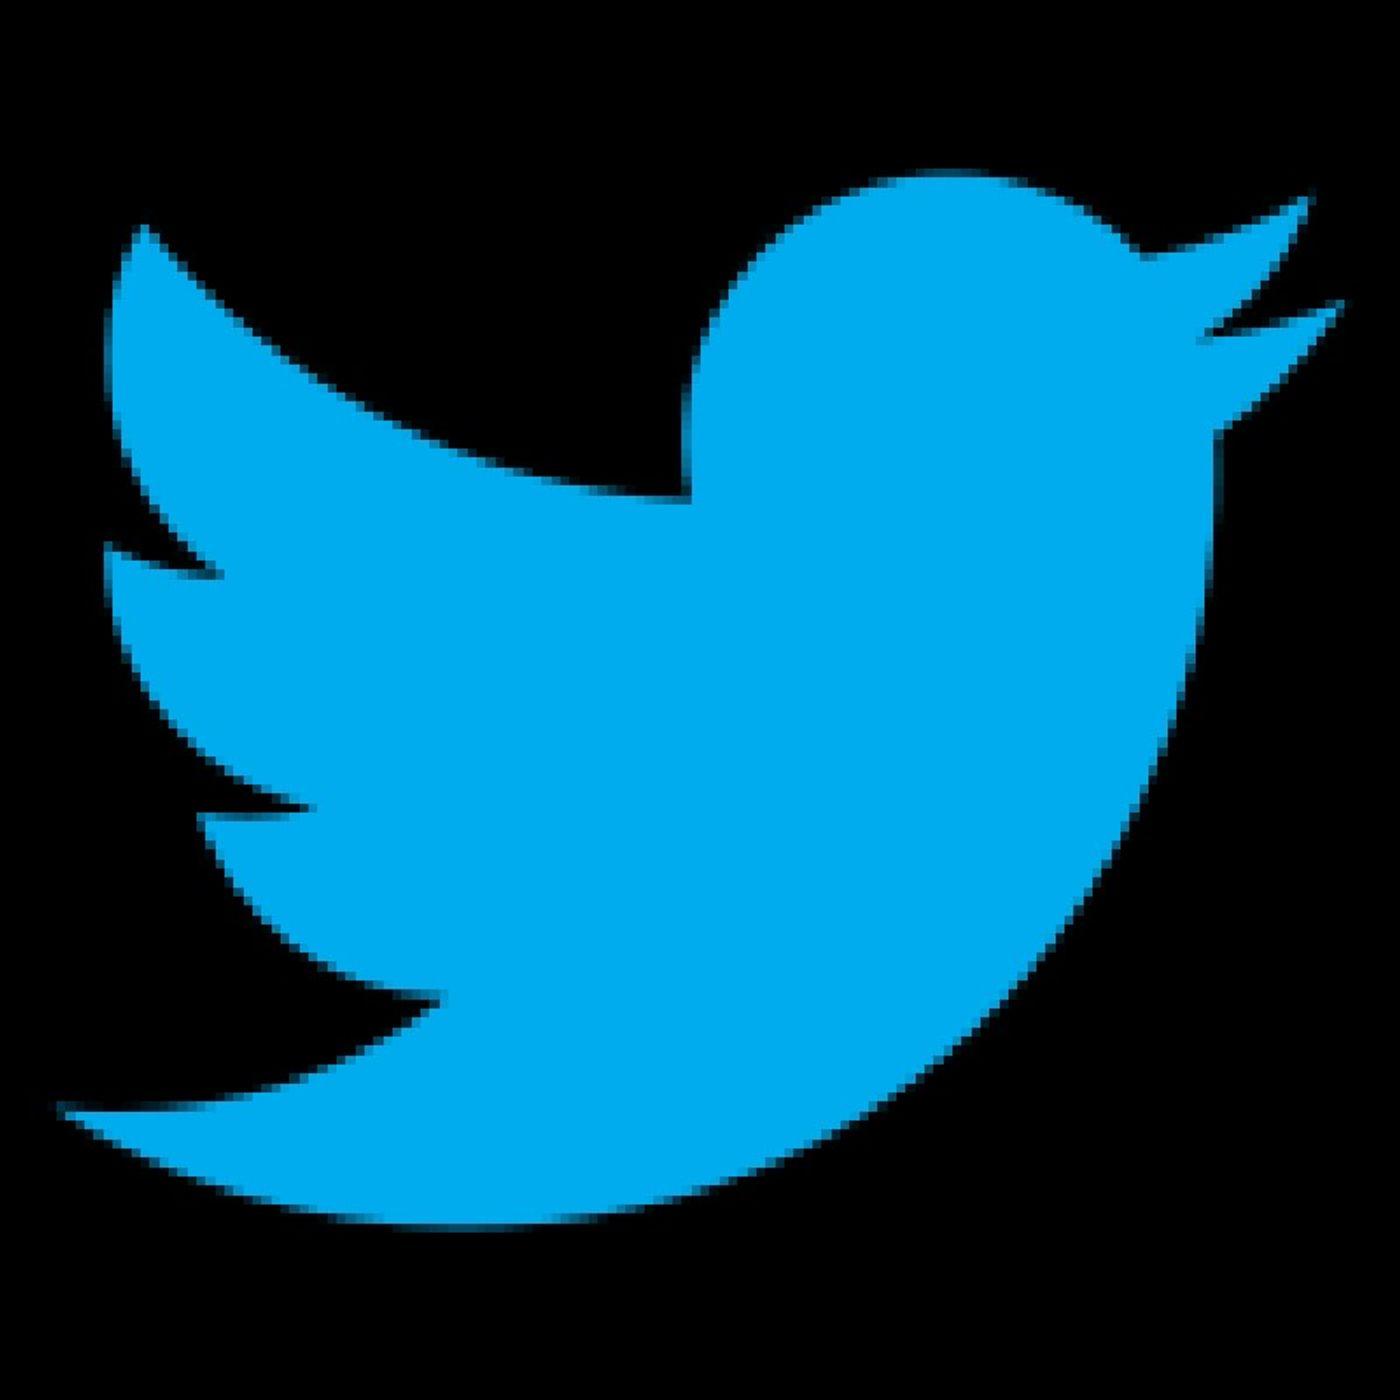 Episode 1369 - Twitter Permanently Bans Former NYT Journalist Alex Berenson